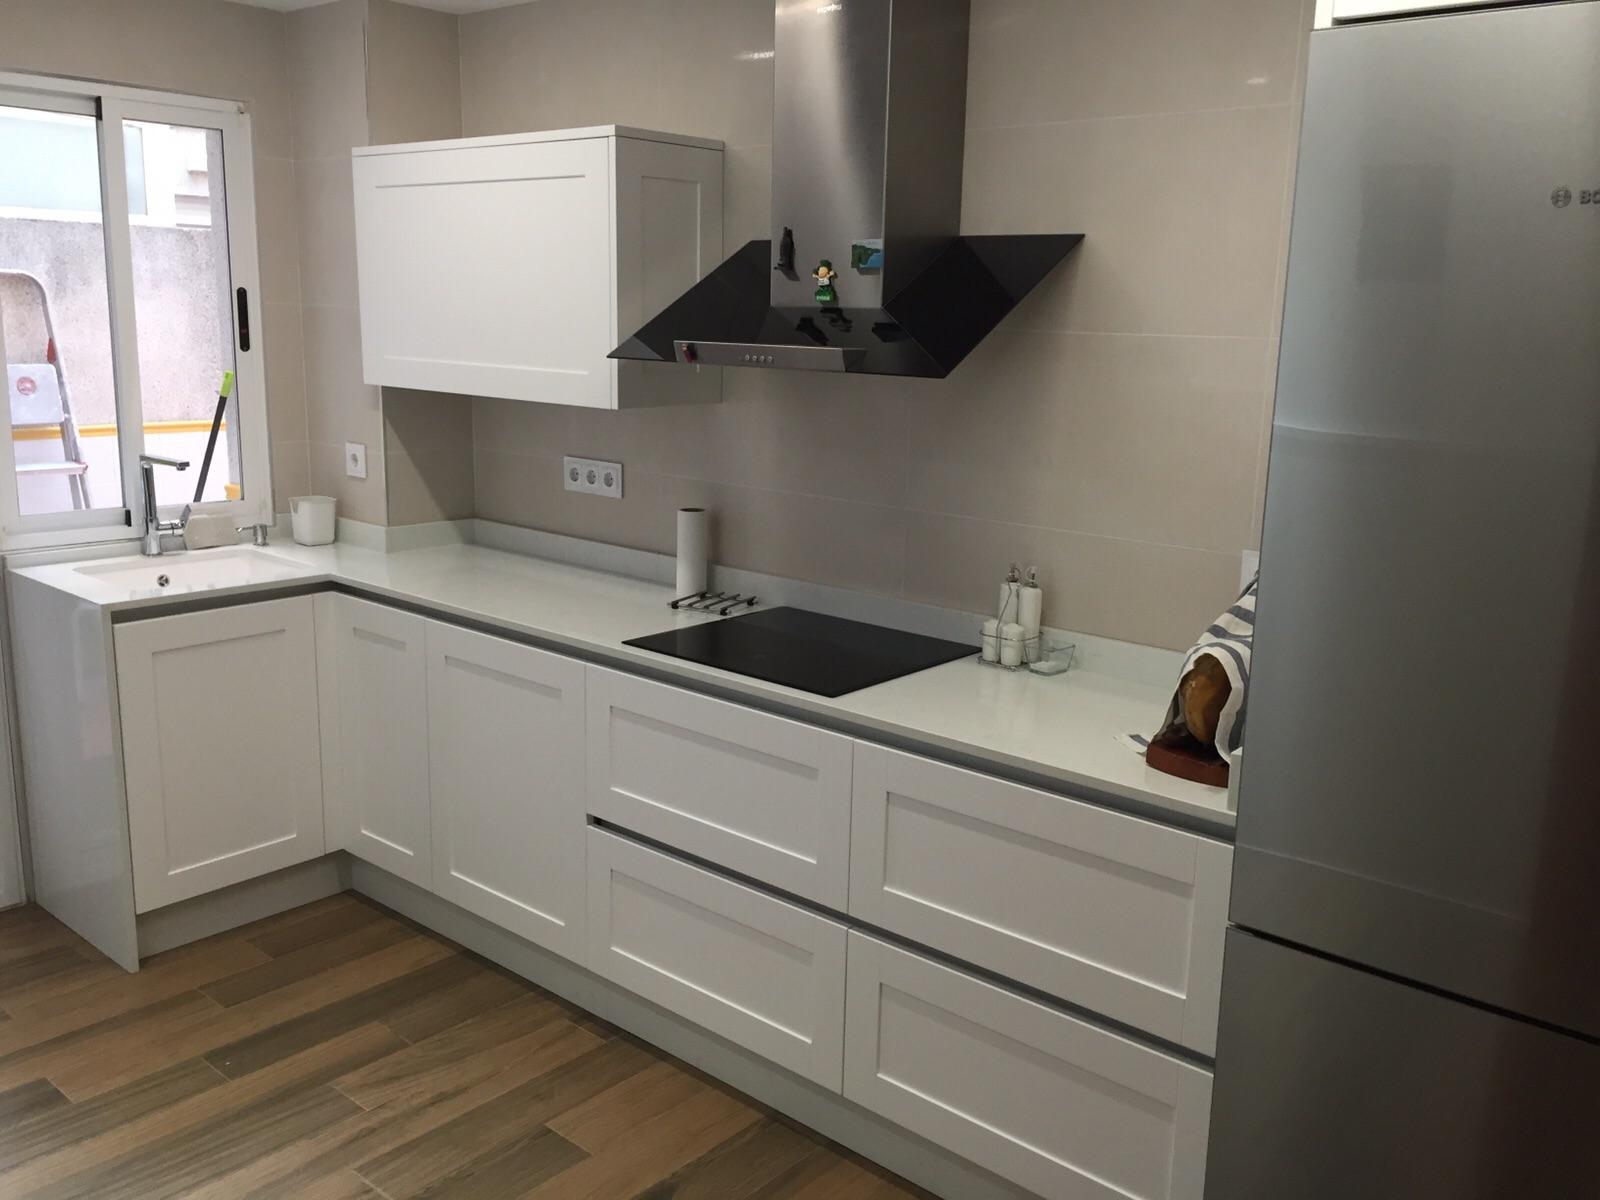 Cocina blanca enmarcada lacado satinado actualcocinas for Cocinas blancas 2016